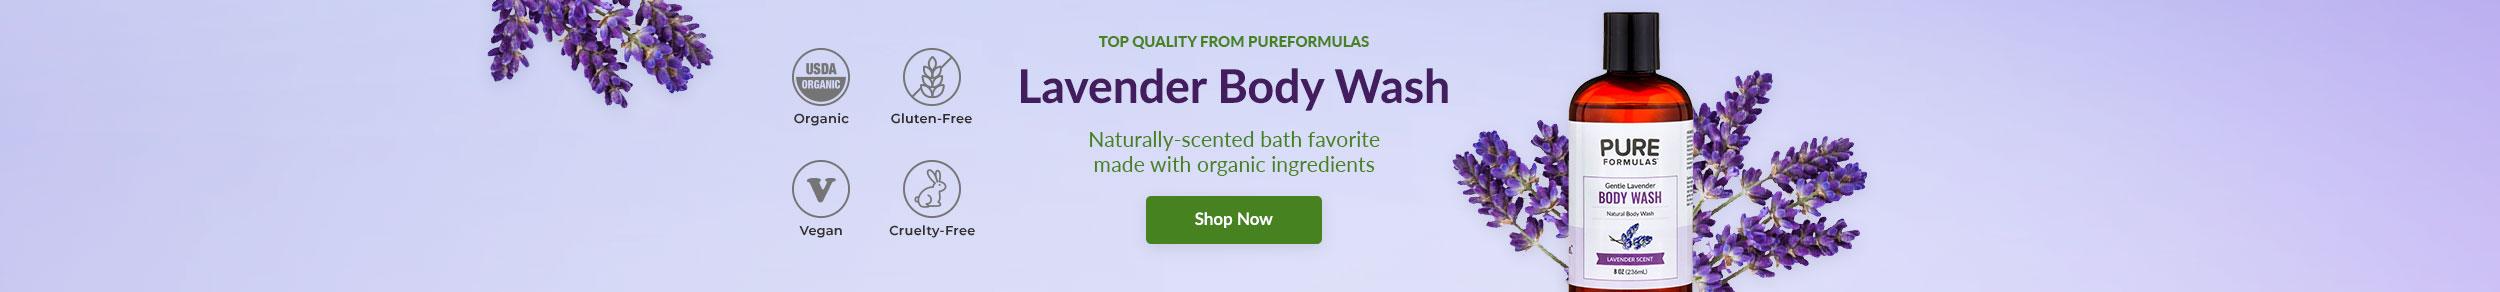 https://i3.pureformulas.net/images/static/Pureformulas-Body-Wash_slide2_061318.jpg